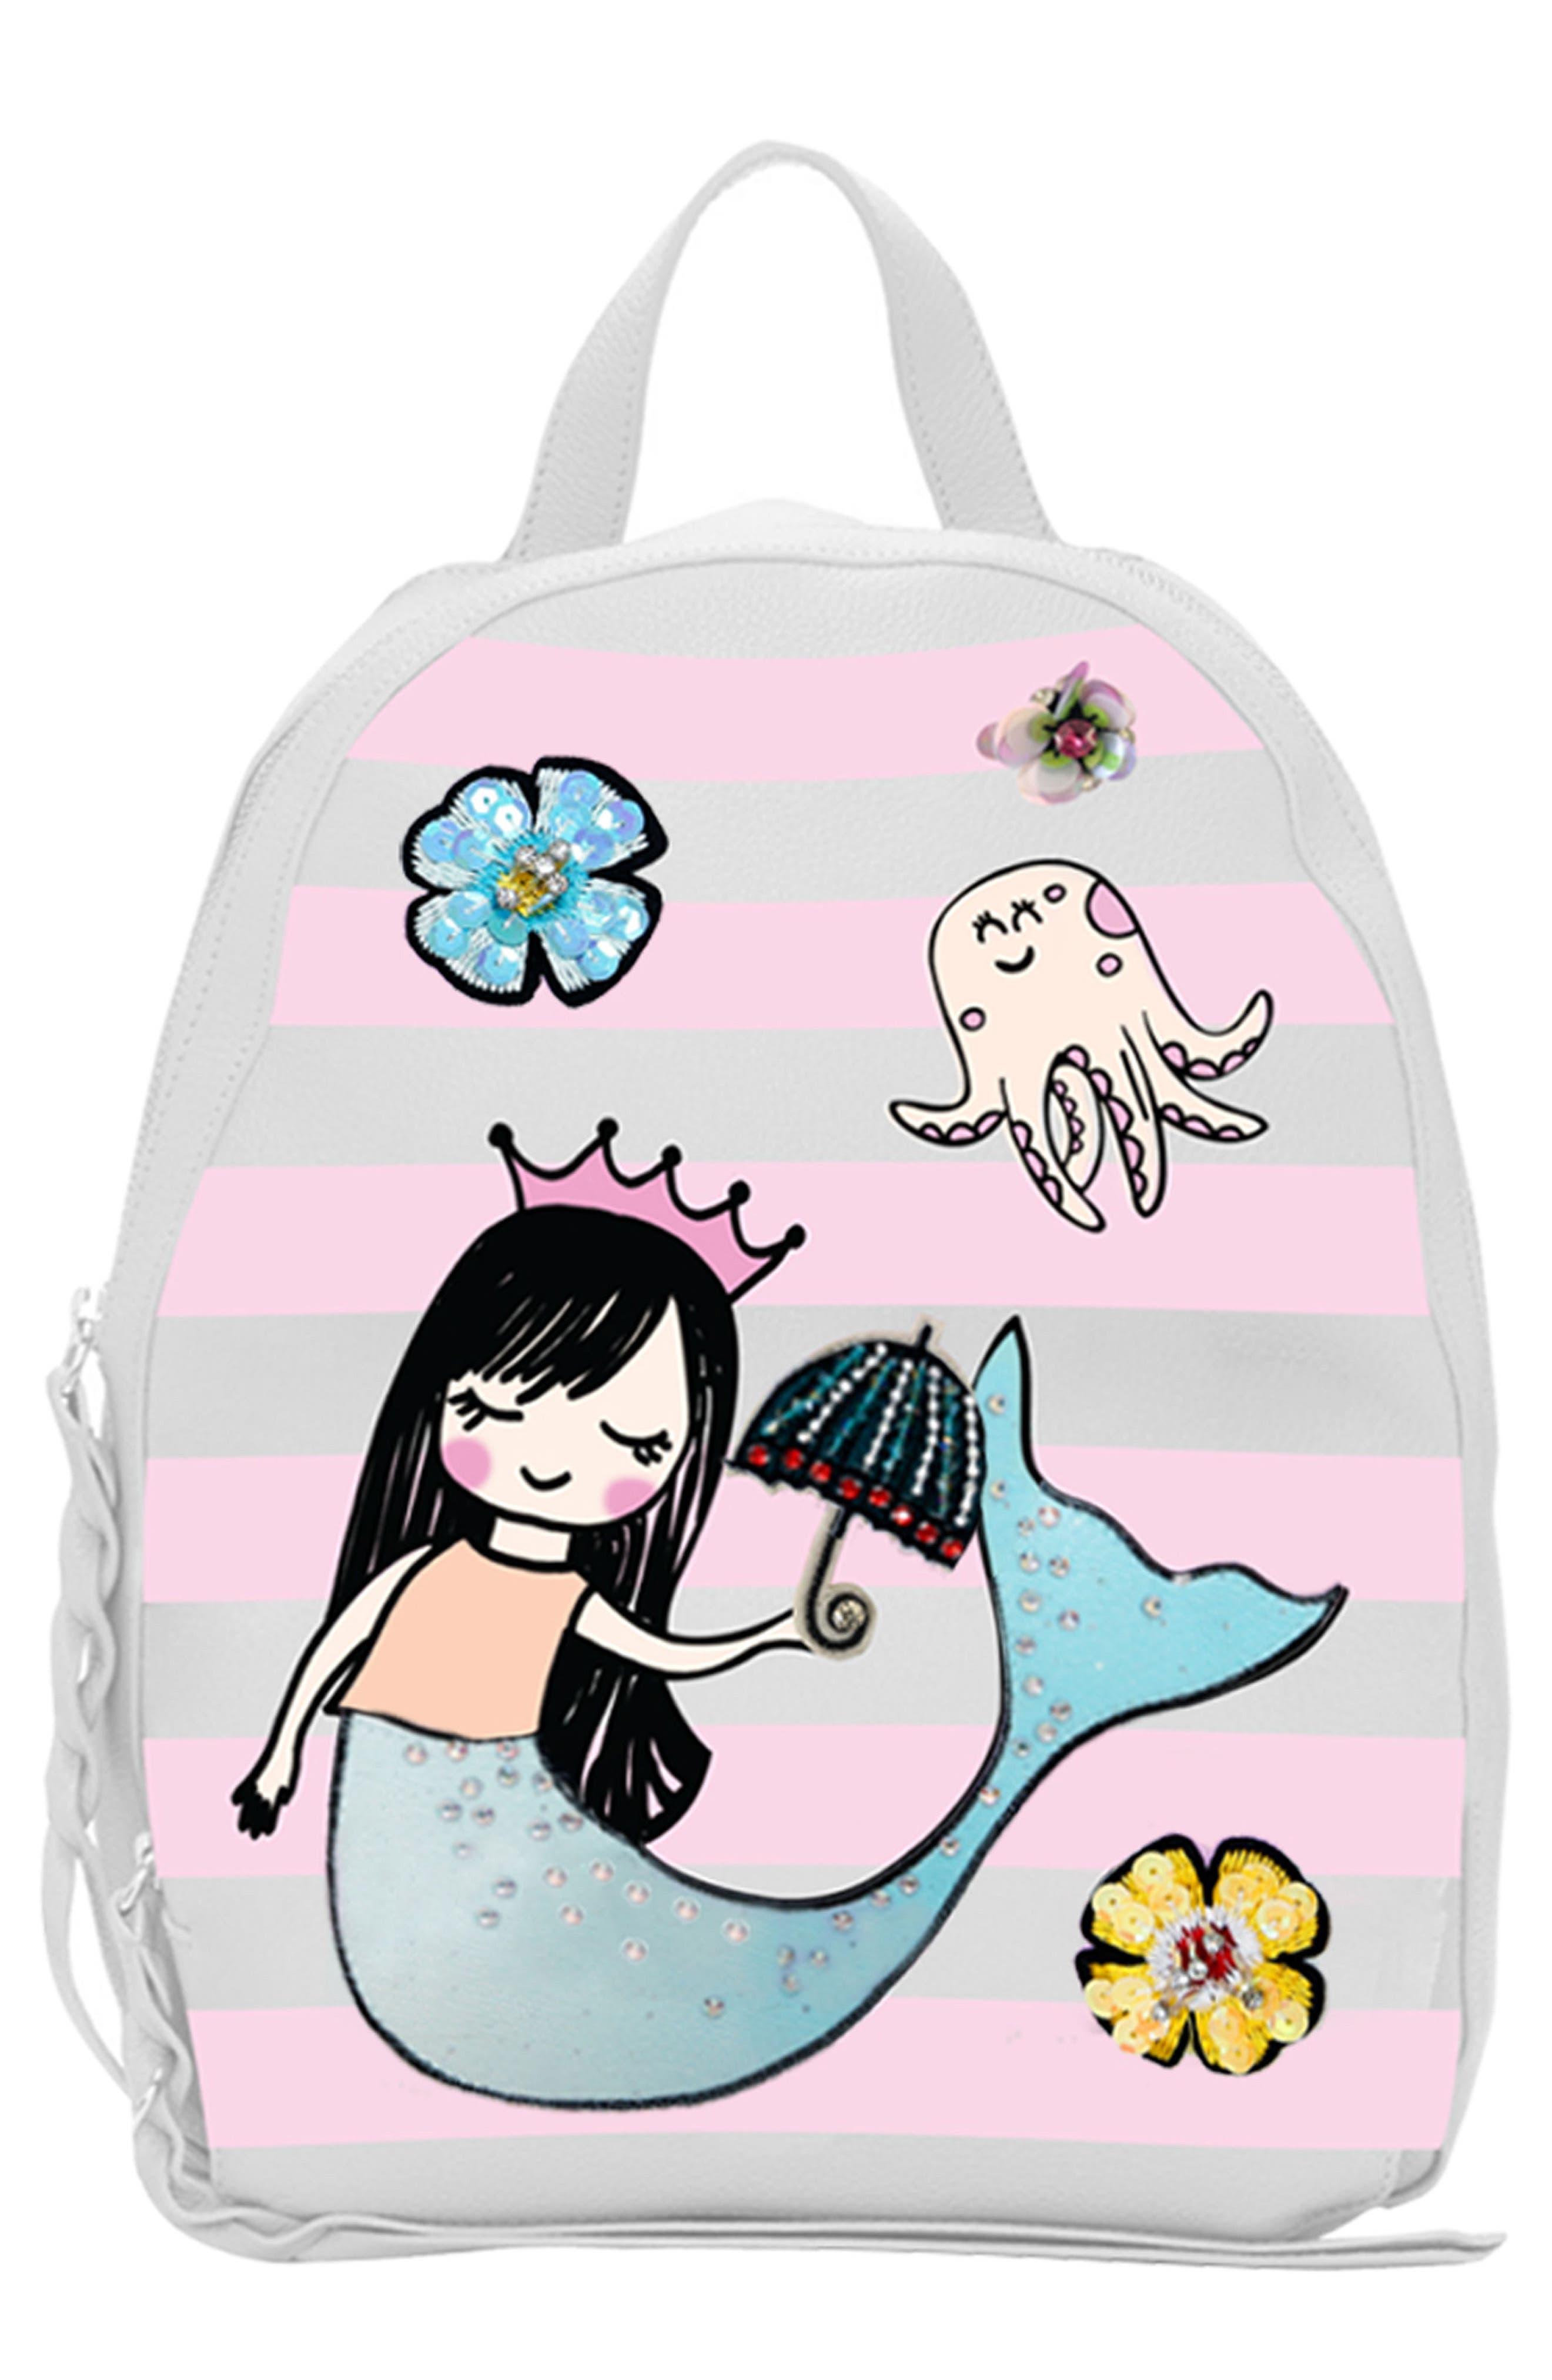 Embellished Mermaid Backpack,                             Main thumbnail 1, color,